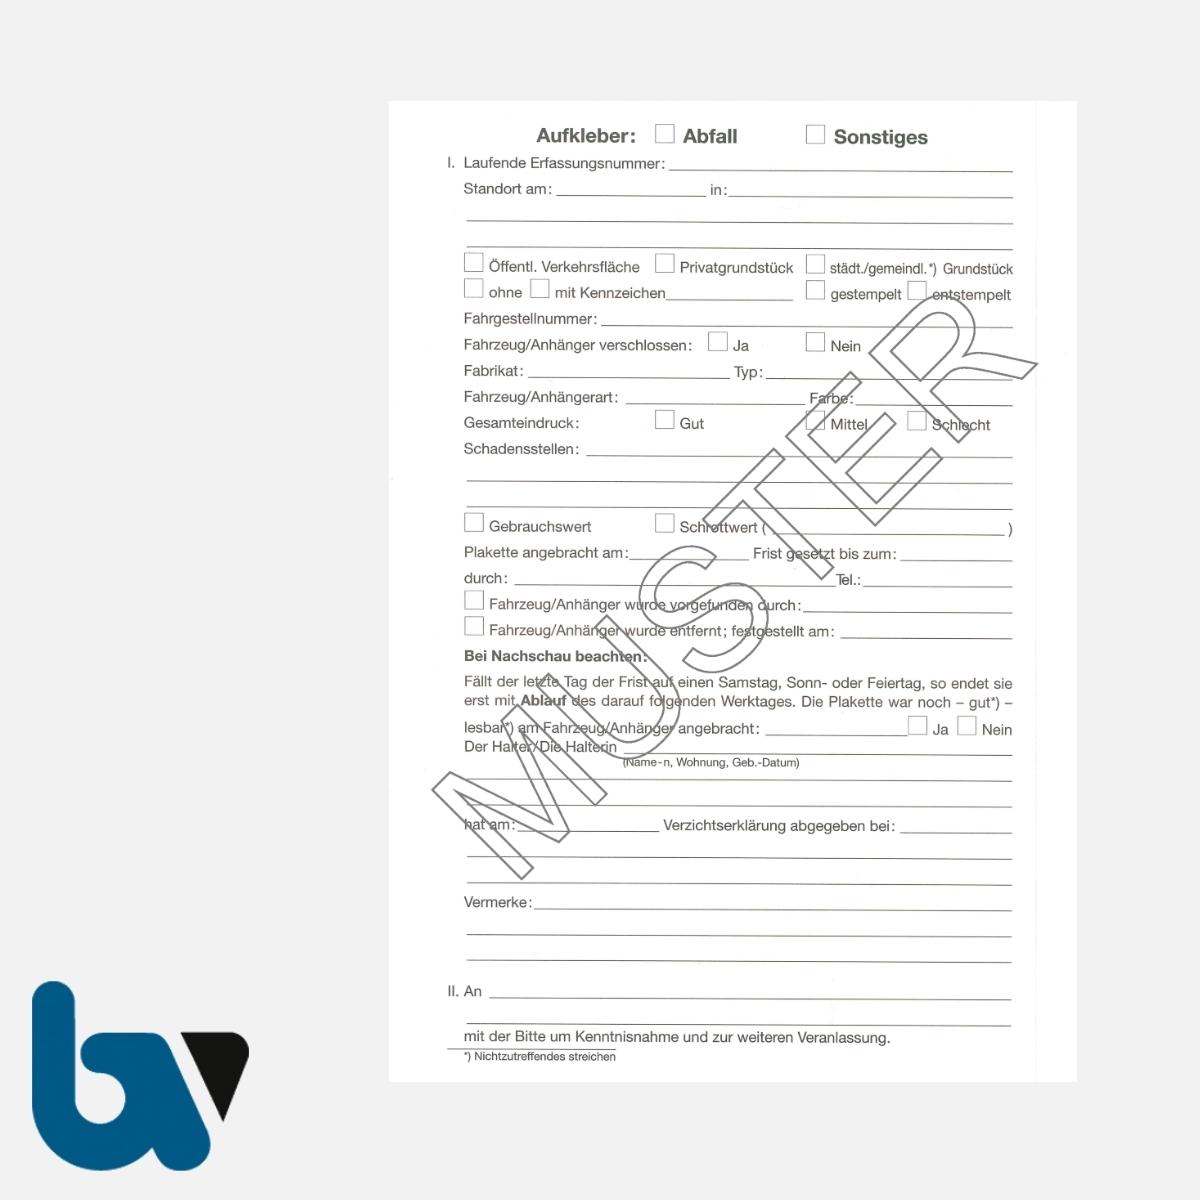 3/442-8 Aufkleber Aufforderung Entfernung Fahrzeug Anhänger selbstklebend Hessen-HStrG HSOG StVO KrWG Aufnahmeprotokoll Abfall DIN A5 RS | Borgard Verlag GmbH